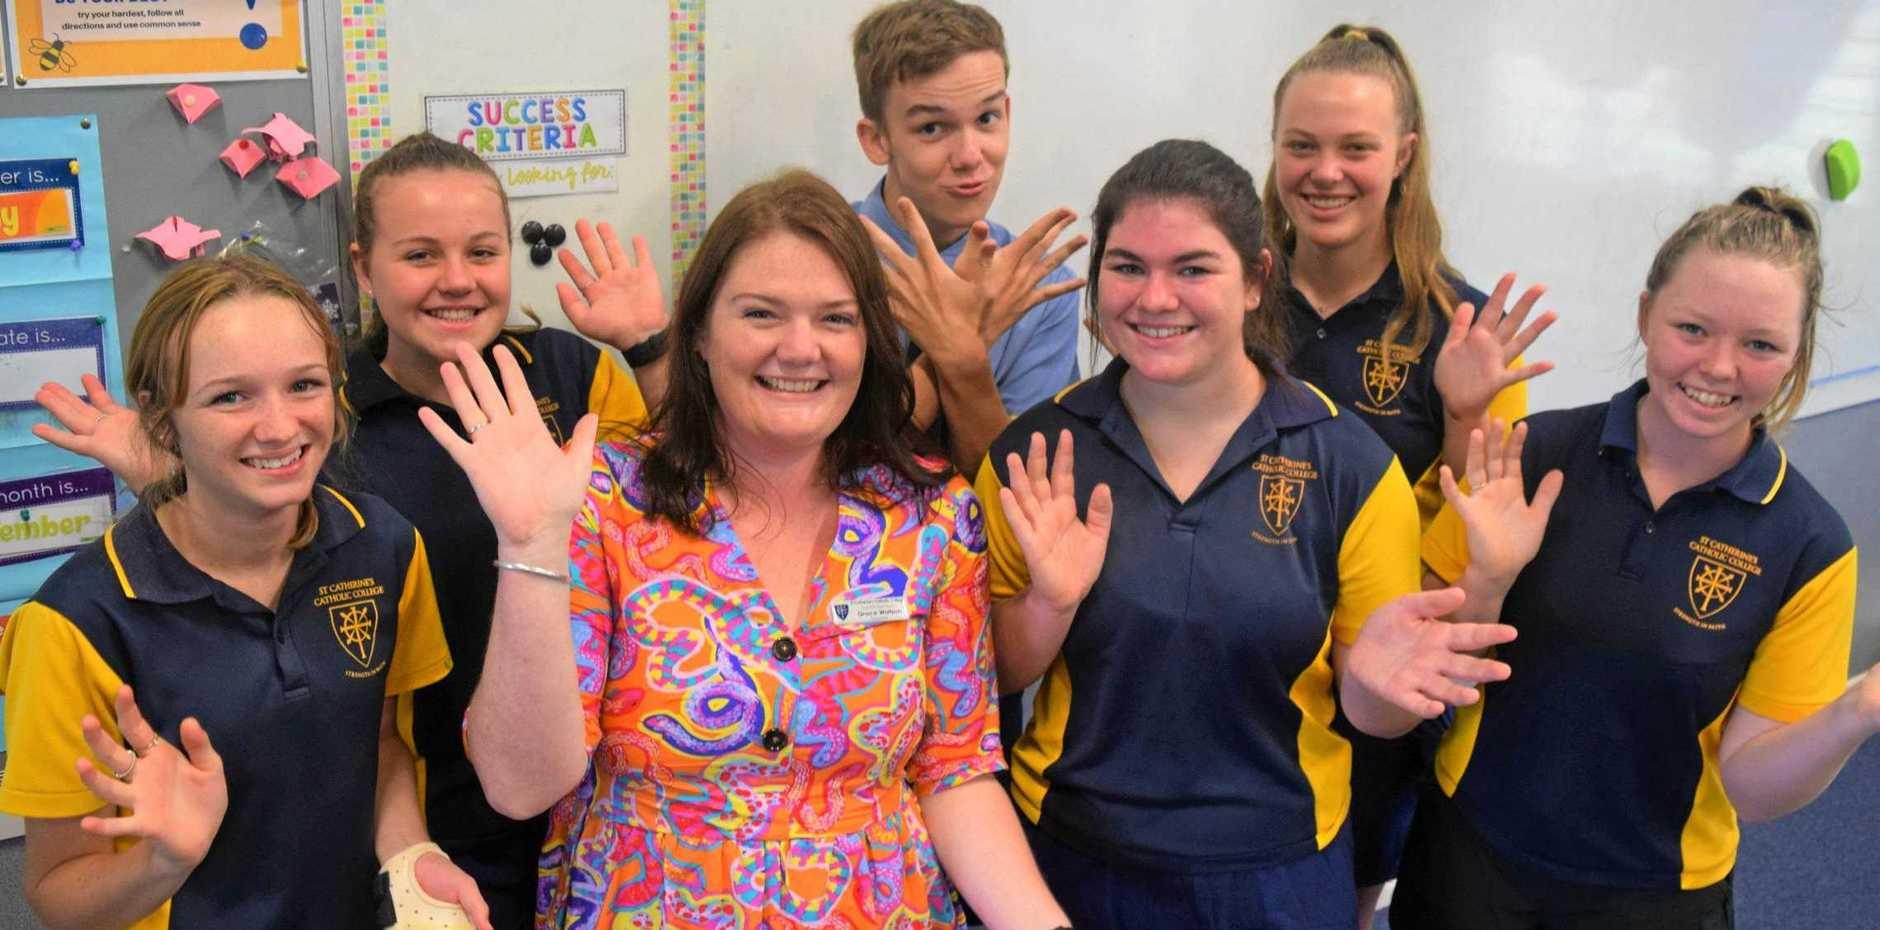 Miss Grace Watson with students (back) Zac Maynard, (middle) Taylor Porter, Jessica Porter, (front) Tegan Gravelle, Stella Maloney and Sam Biley.